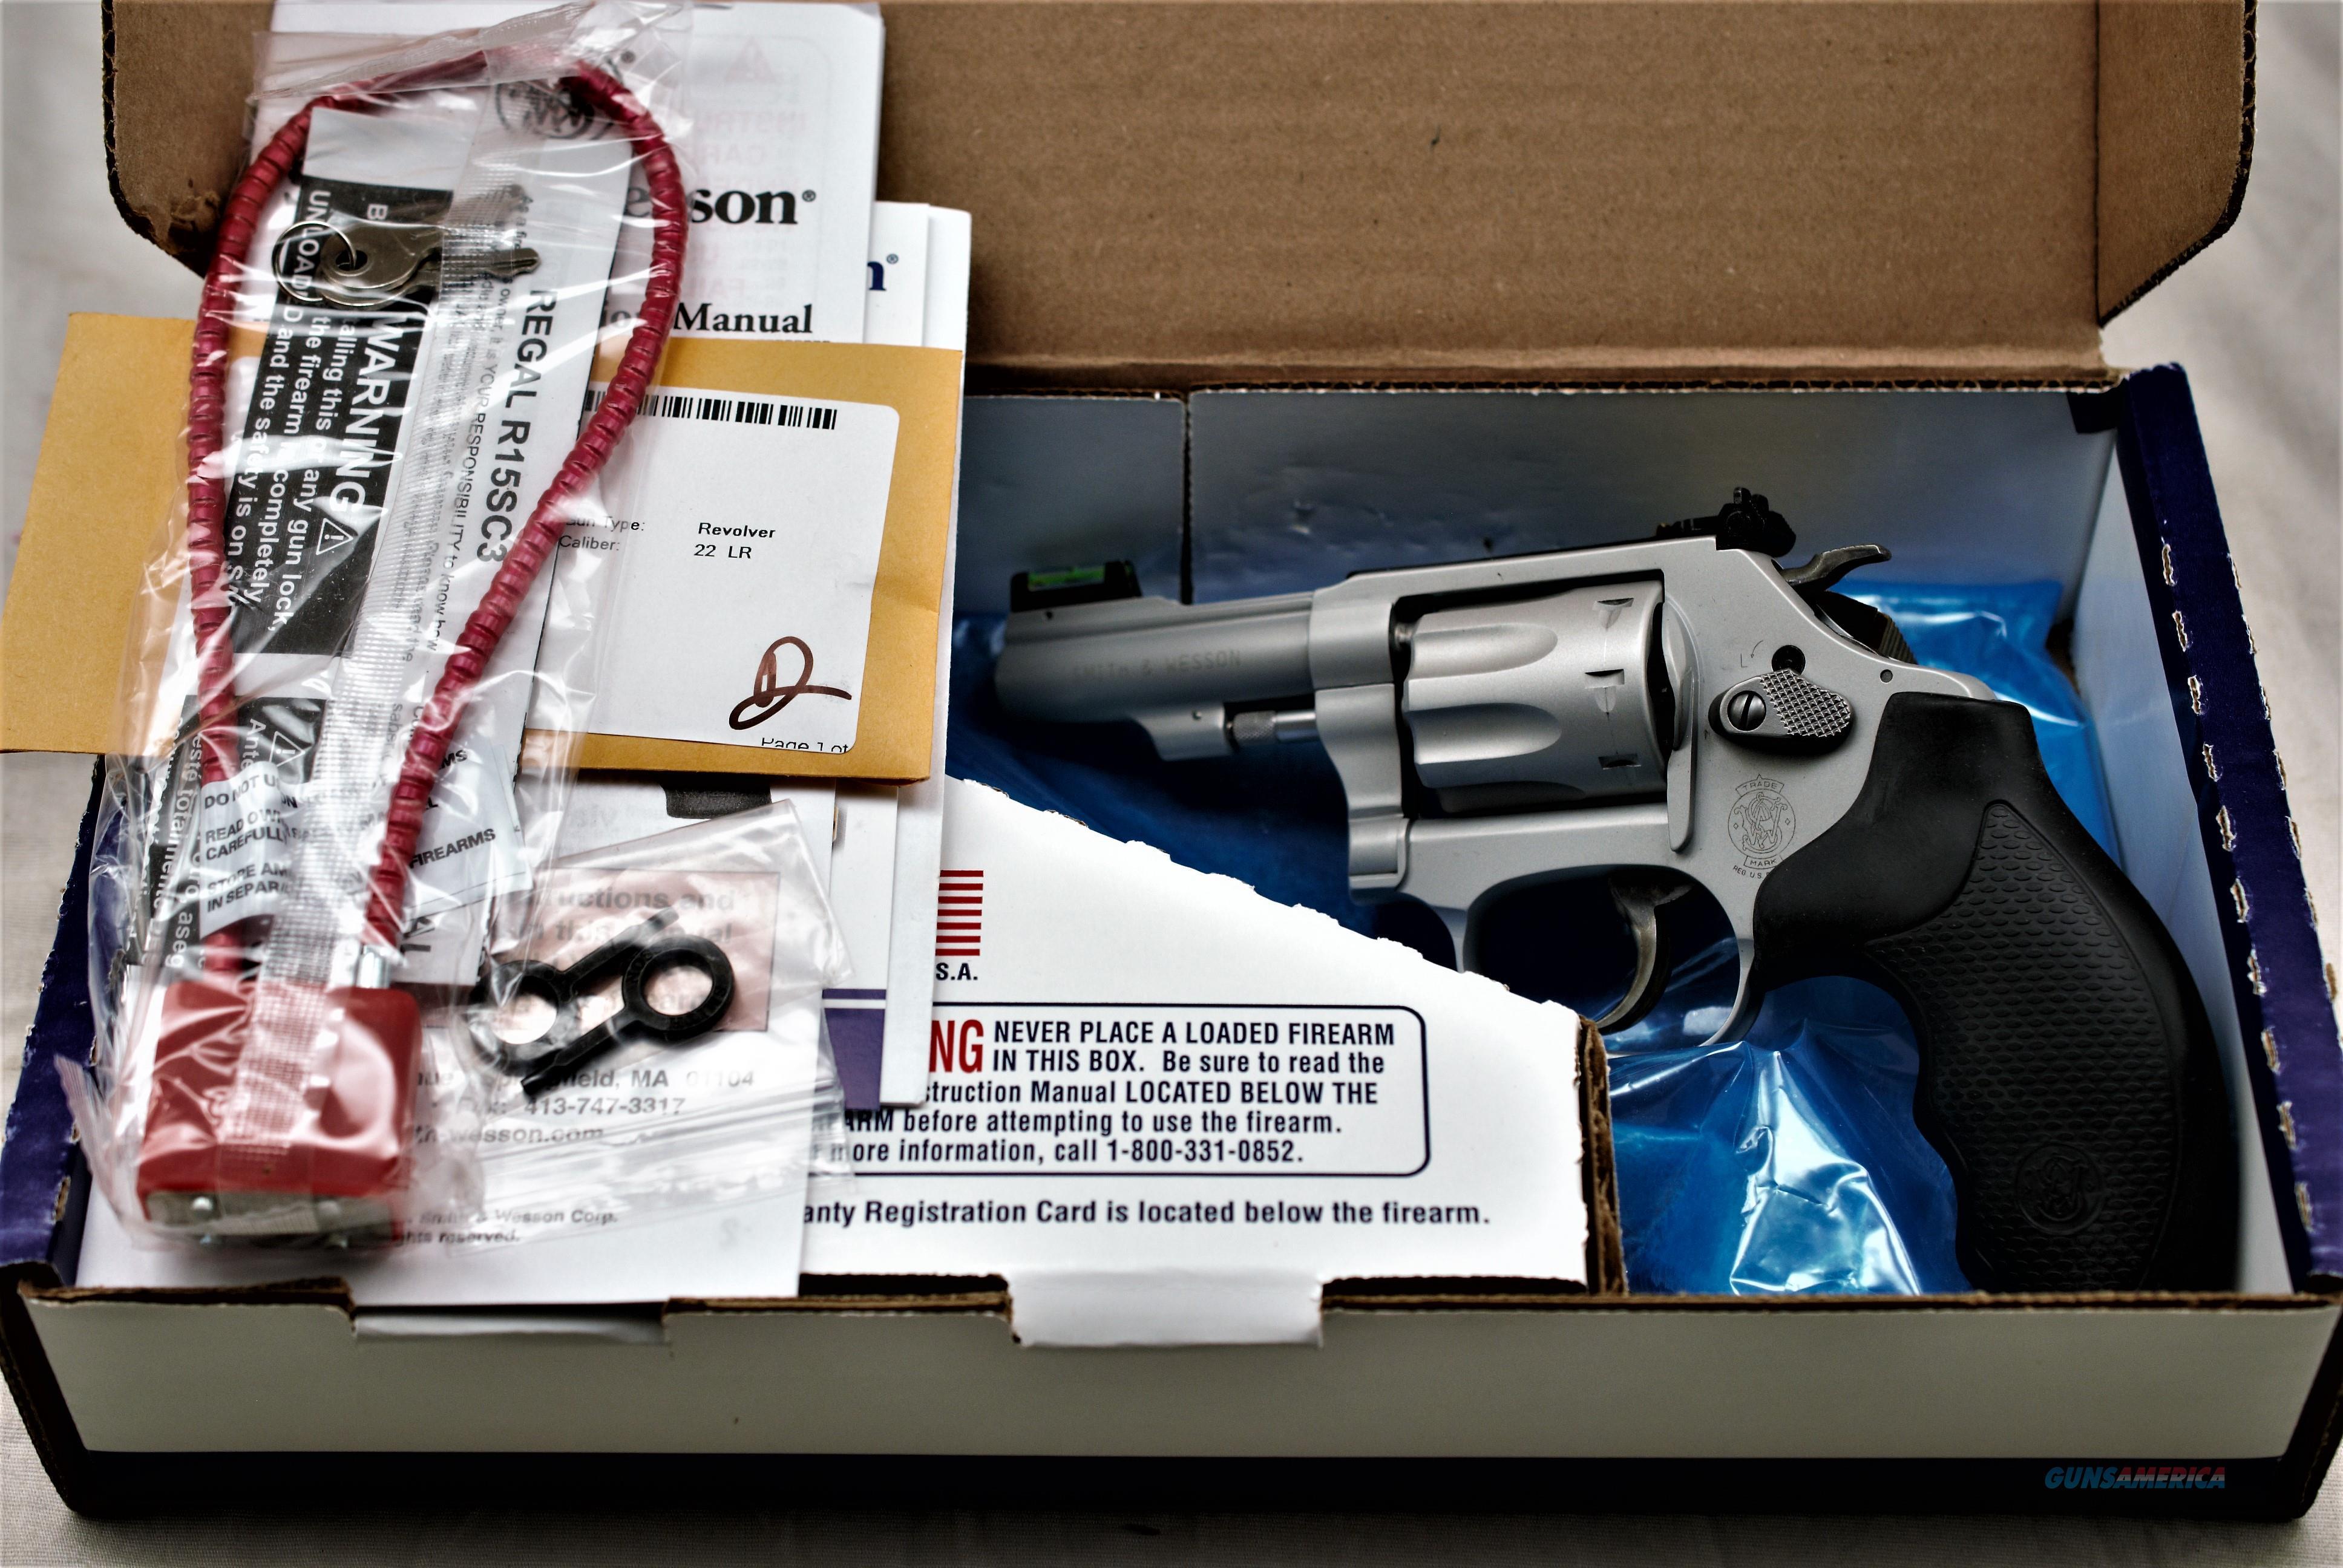 S & W 317-3 22 lr Airlite Kit gun   Guns > Pistols > Smith & Wesson Revolvers > Small Frame ( J )